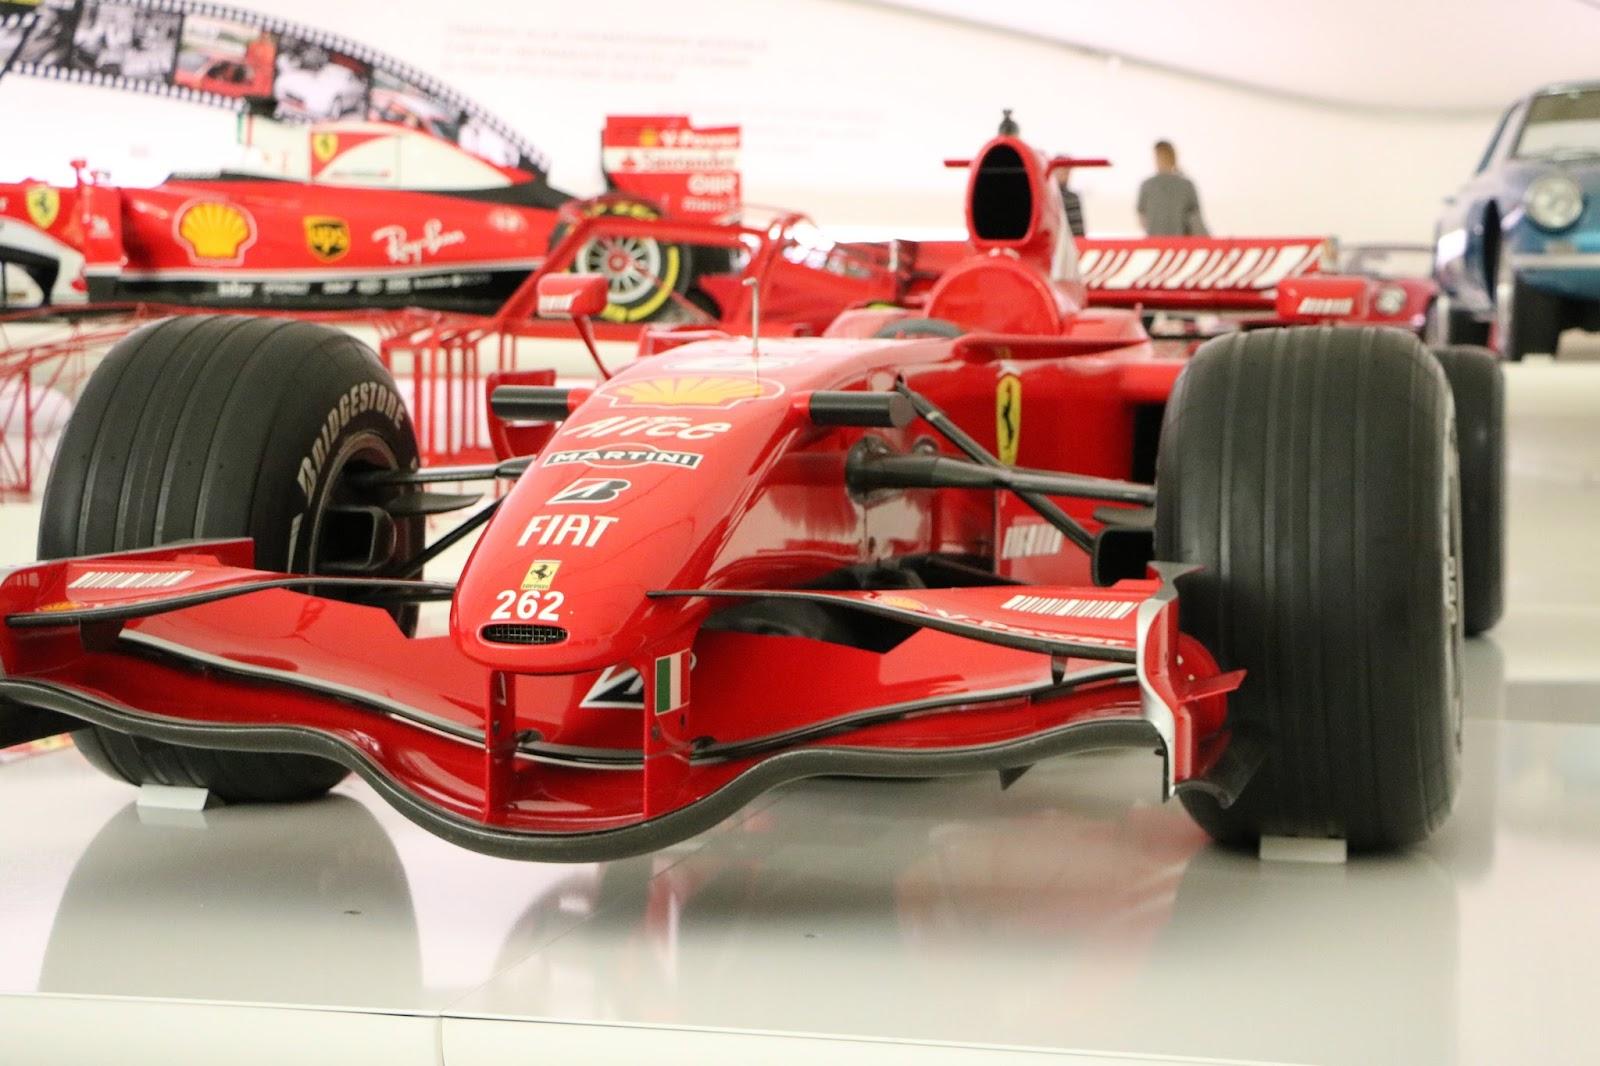 Modena - Enzo Museum 0100 - 2007 Ferrari F1.jpg